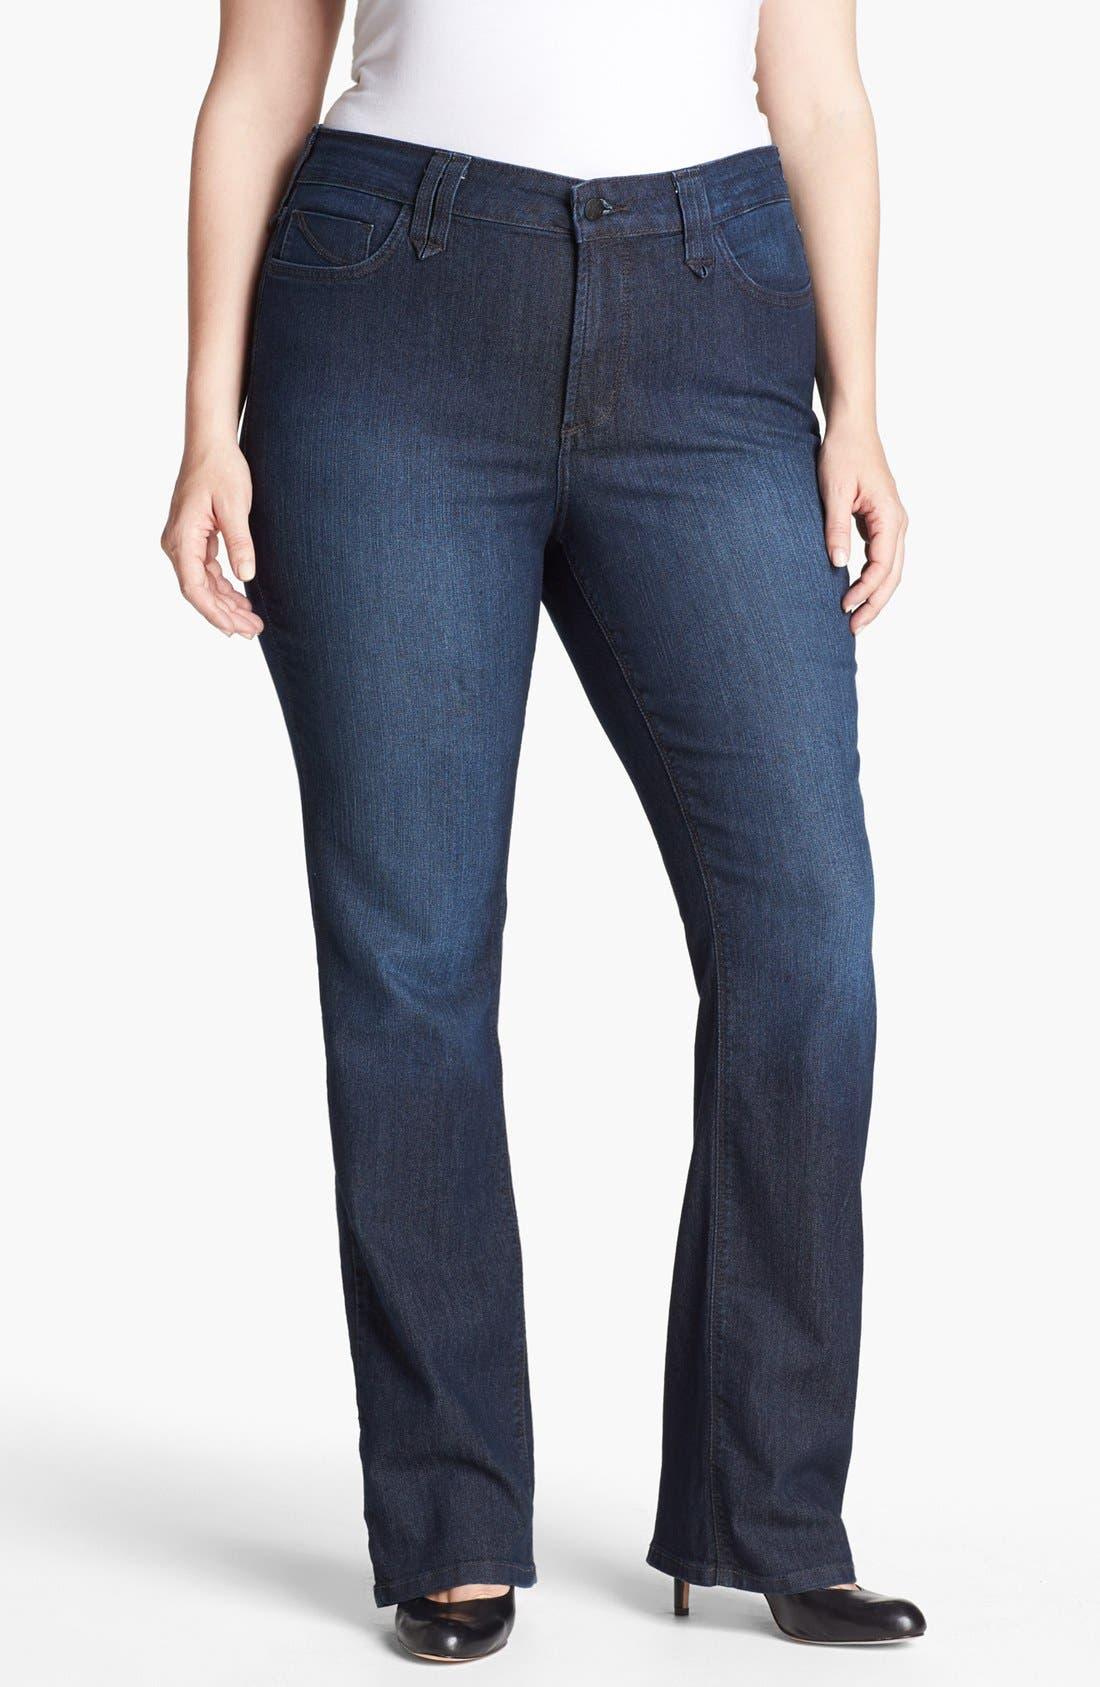 Main Image - NYDJ 'Hayden' Stretch Straight Leg Jeans (Burbank) (Plus Size)